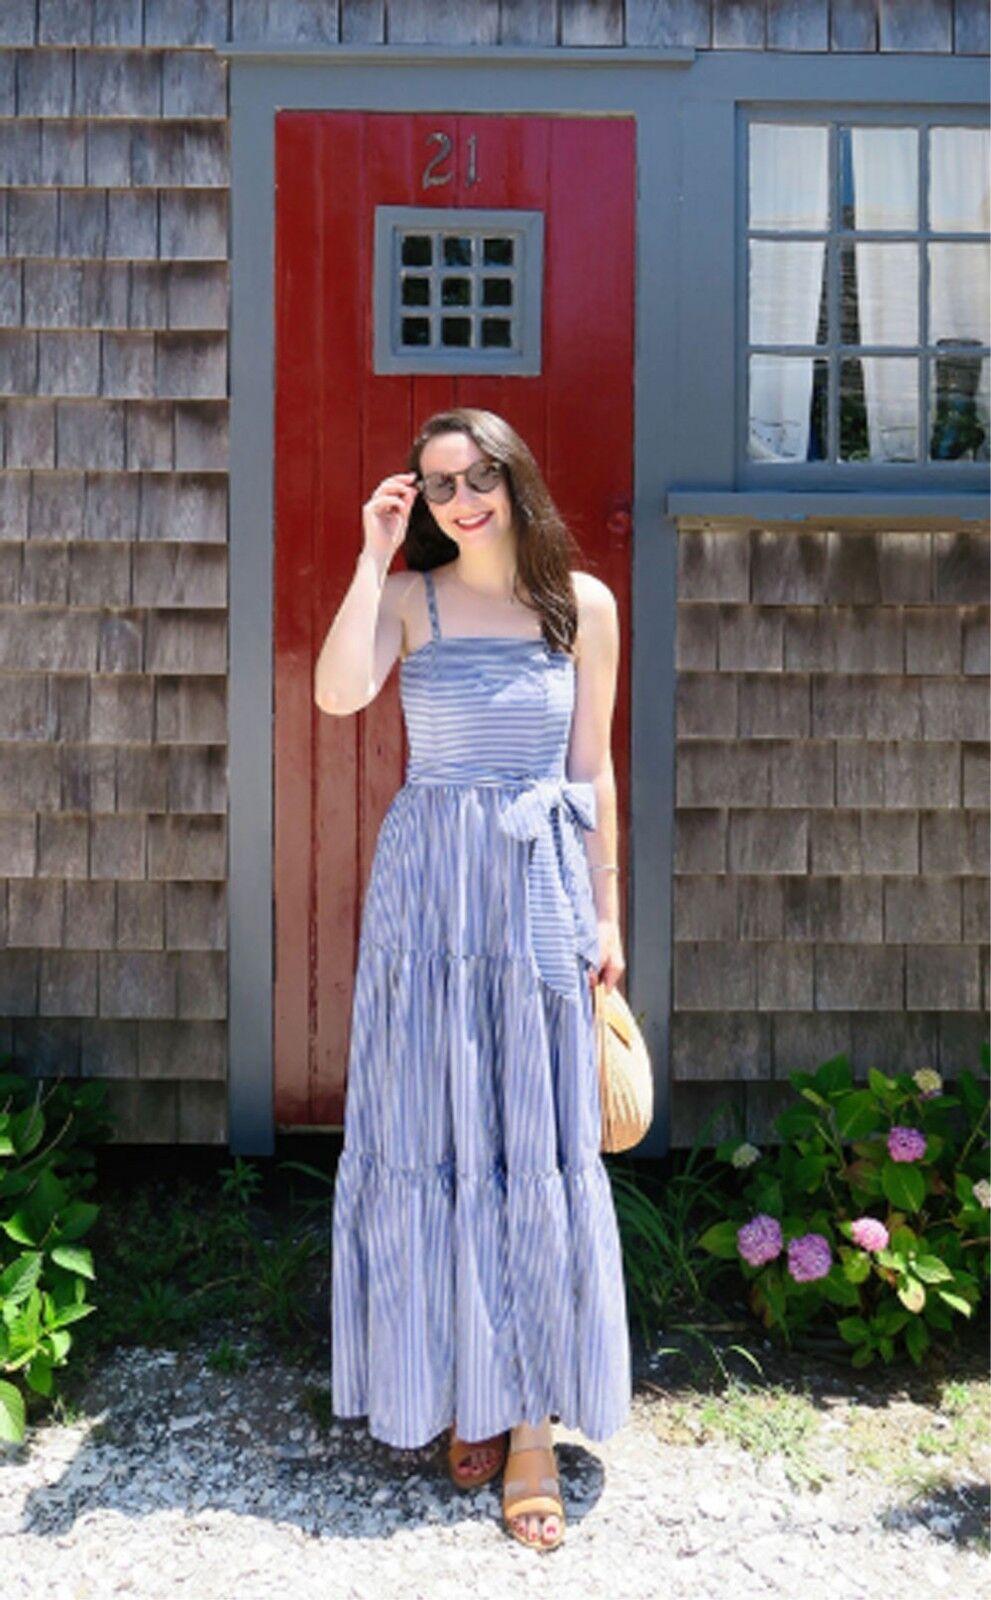 5ea77fb02b3 NWT J.CREW Tiered Maxi Dress in Stripe White Blue 8